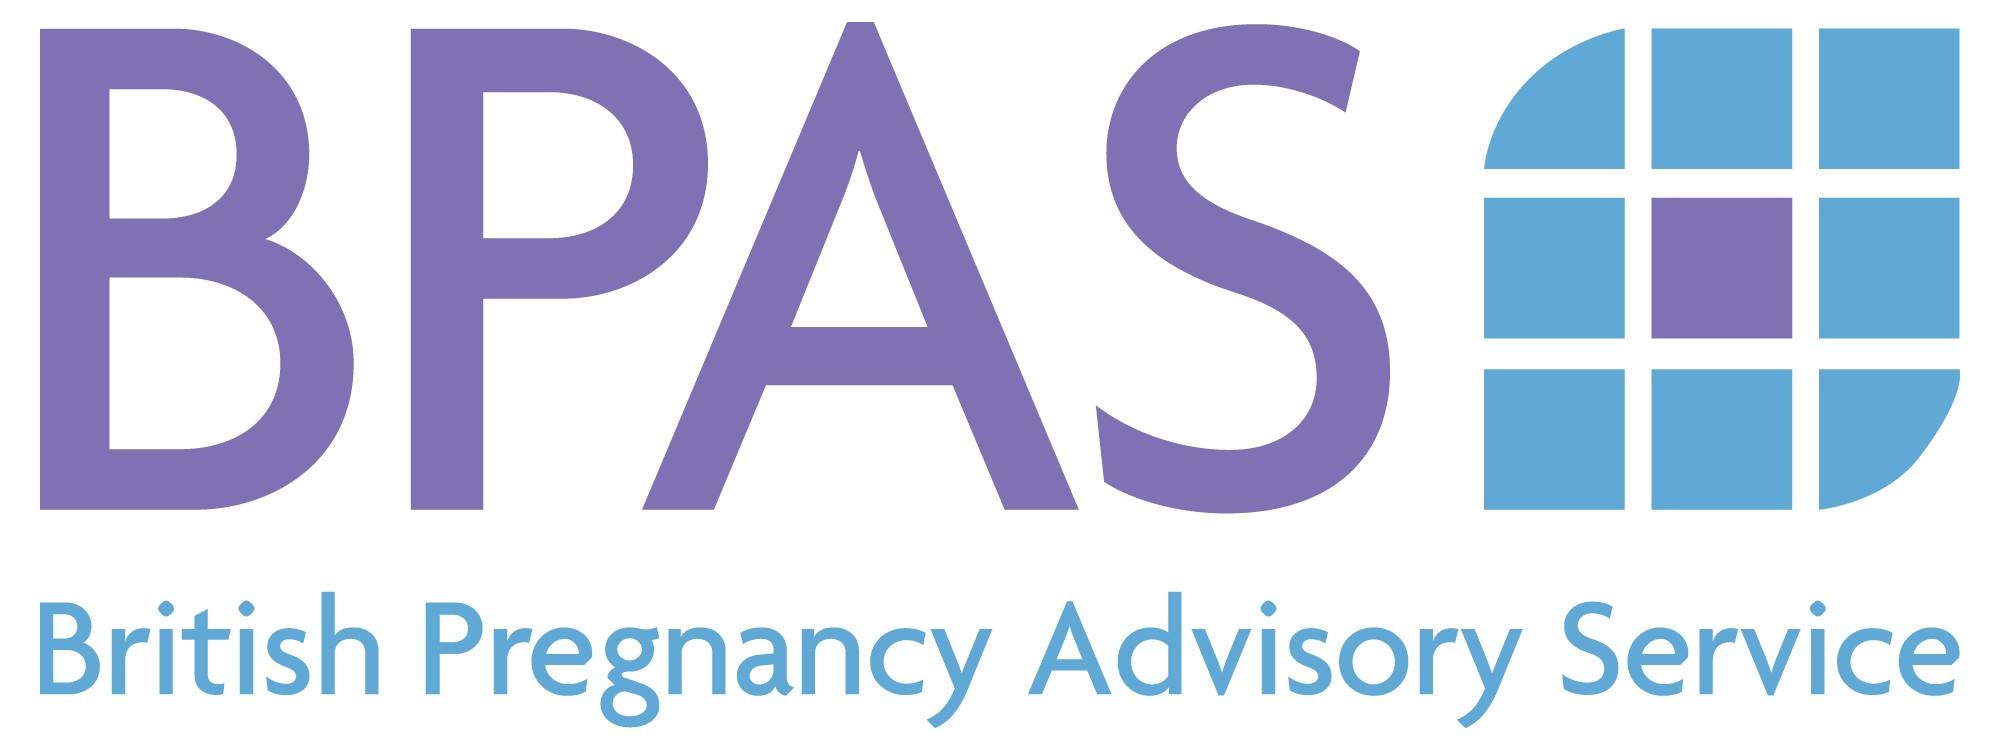 BPAS logo 2020 cmyk normal